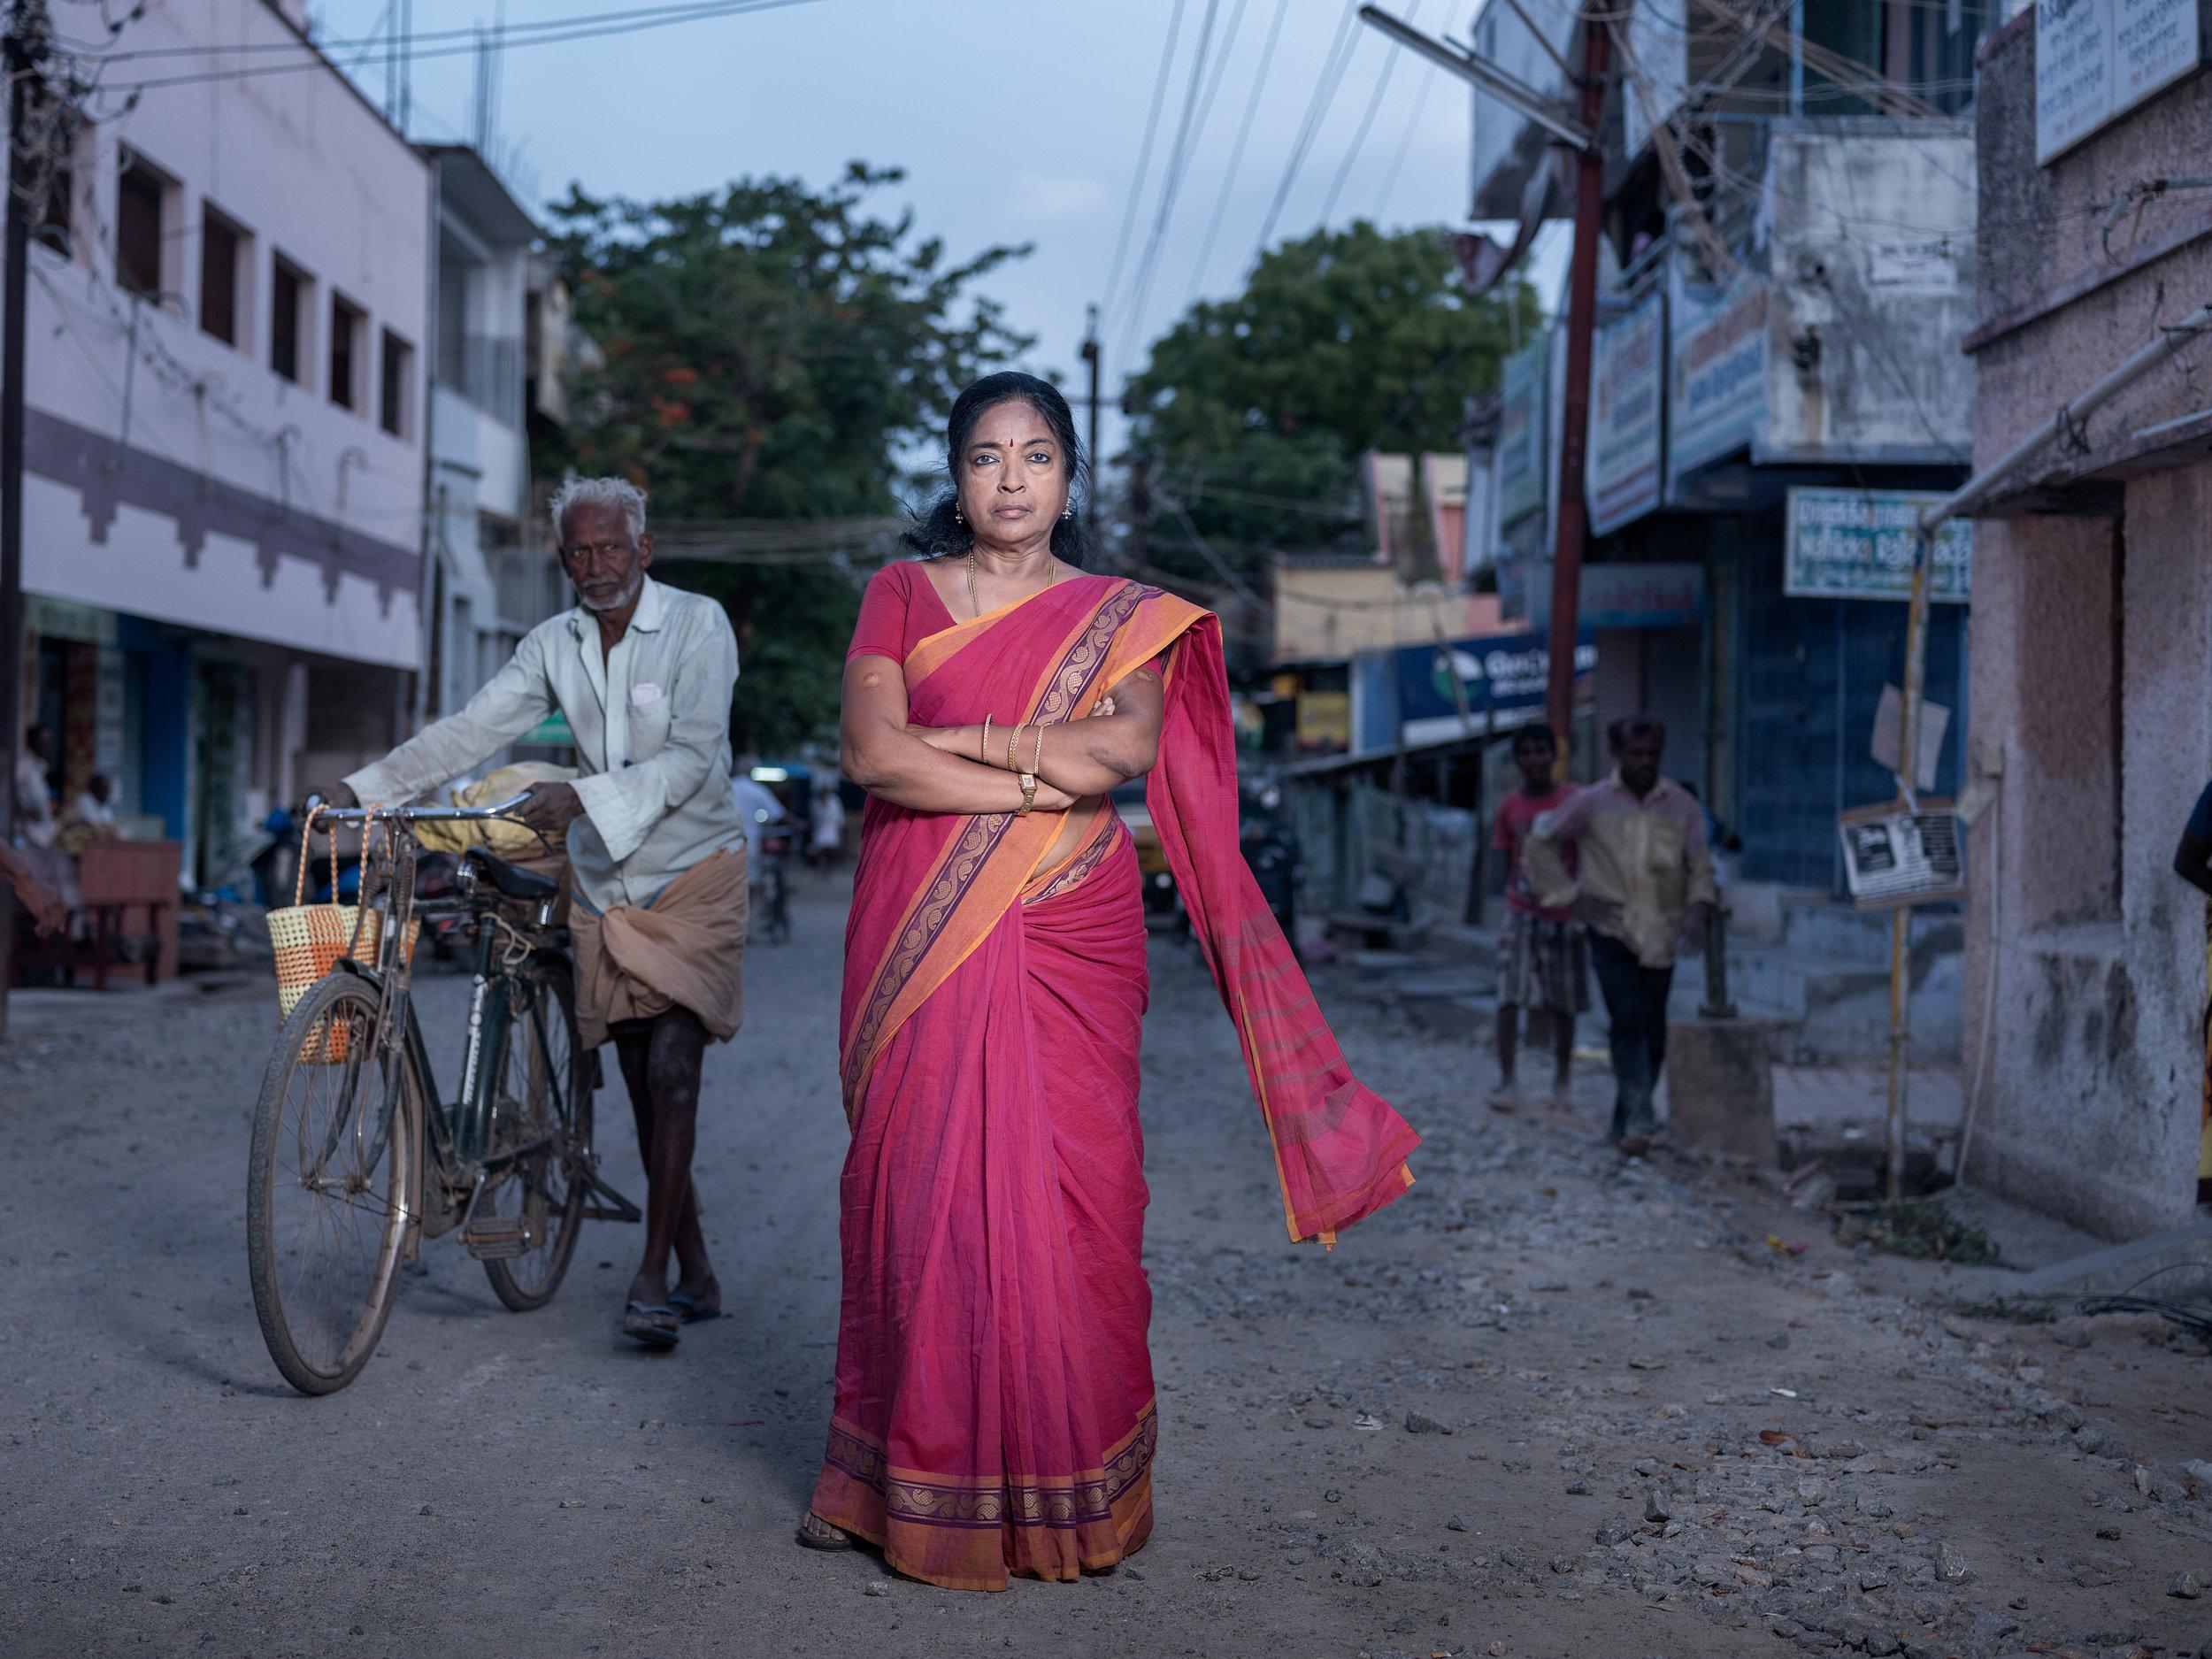 Fatima Babu in the streets of Tuticorin